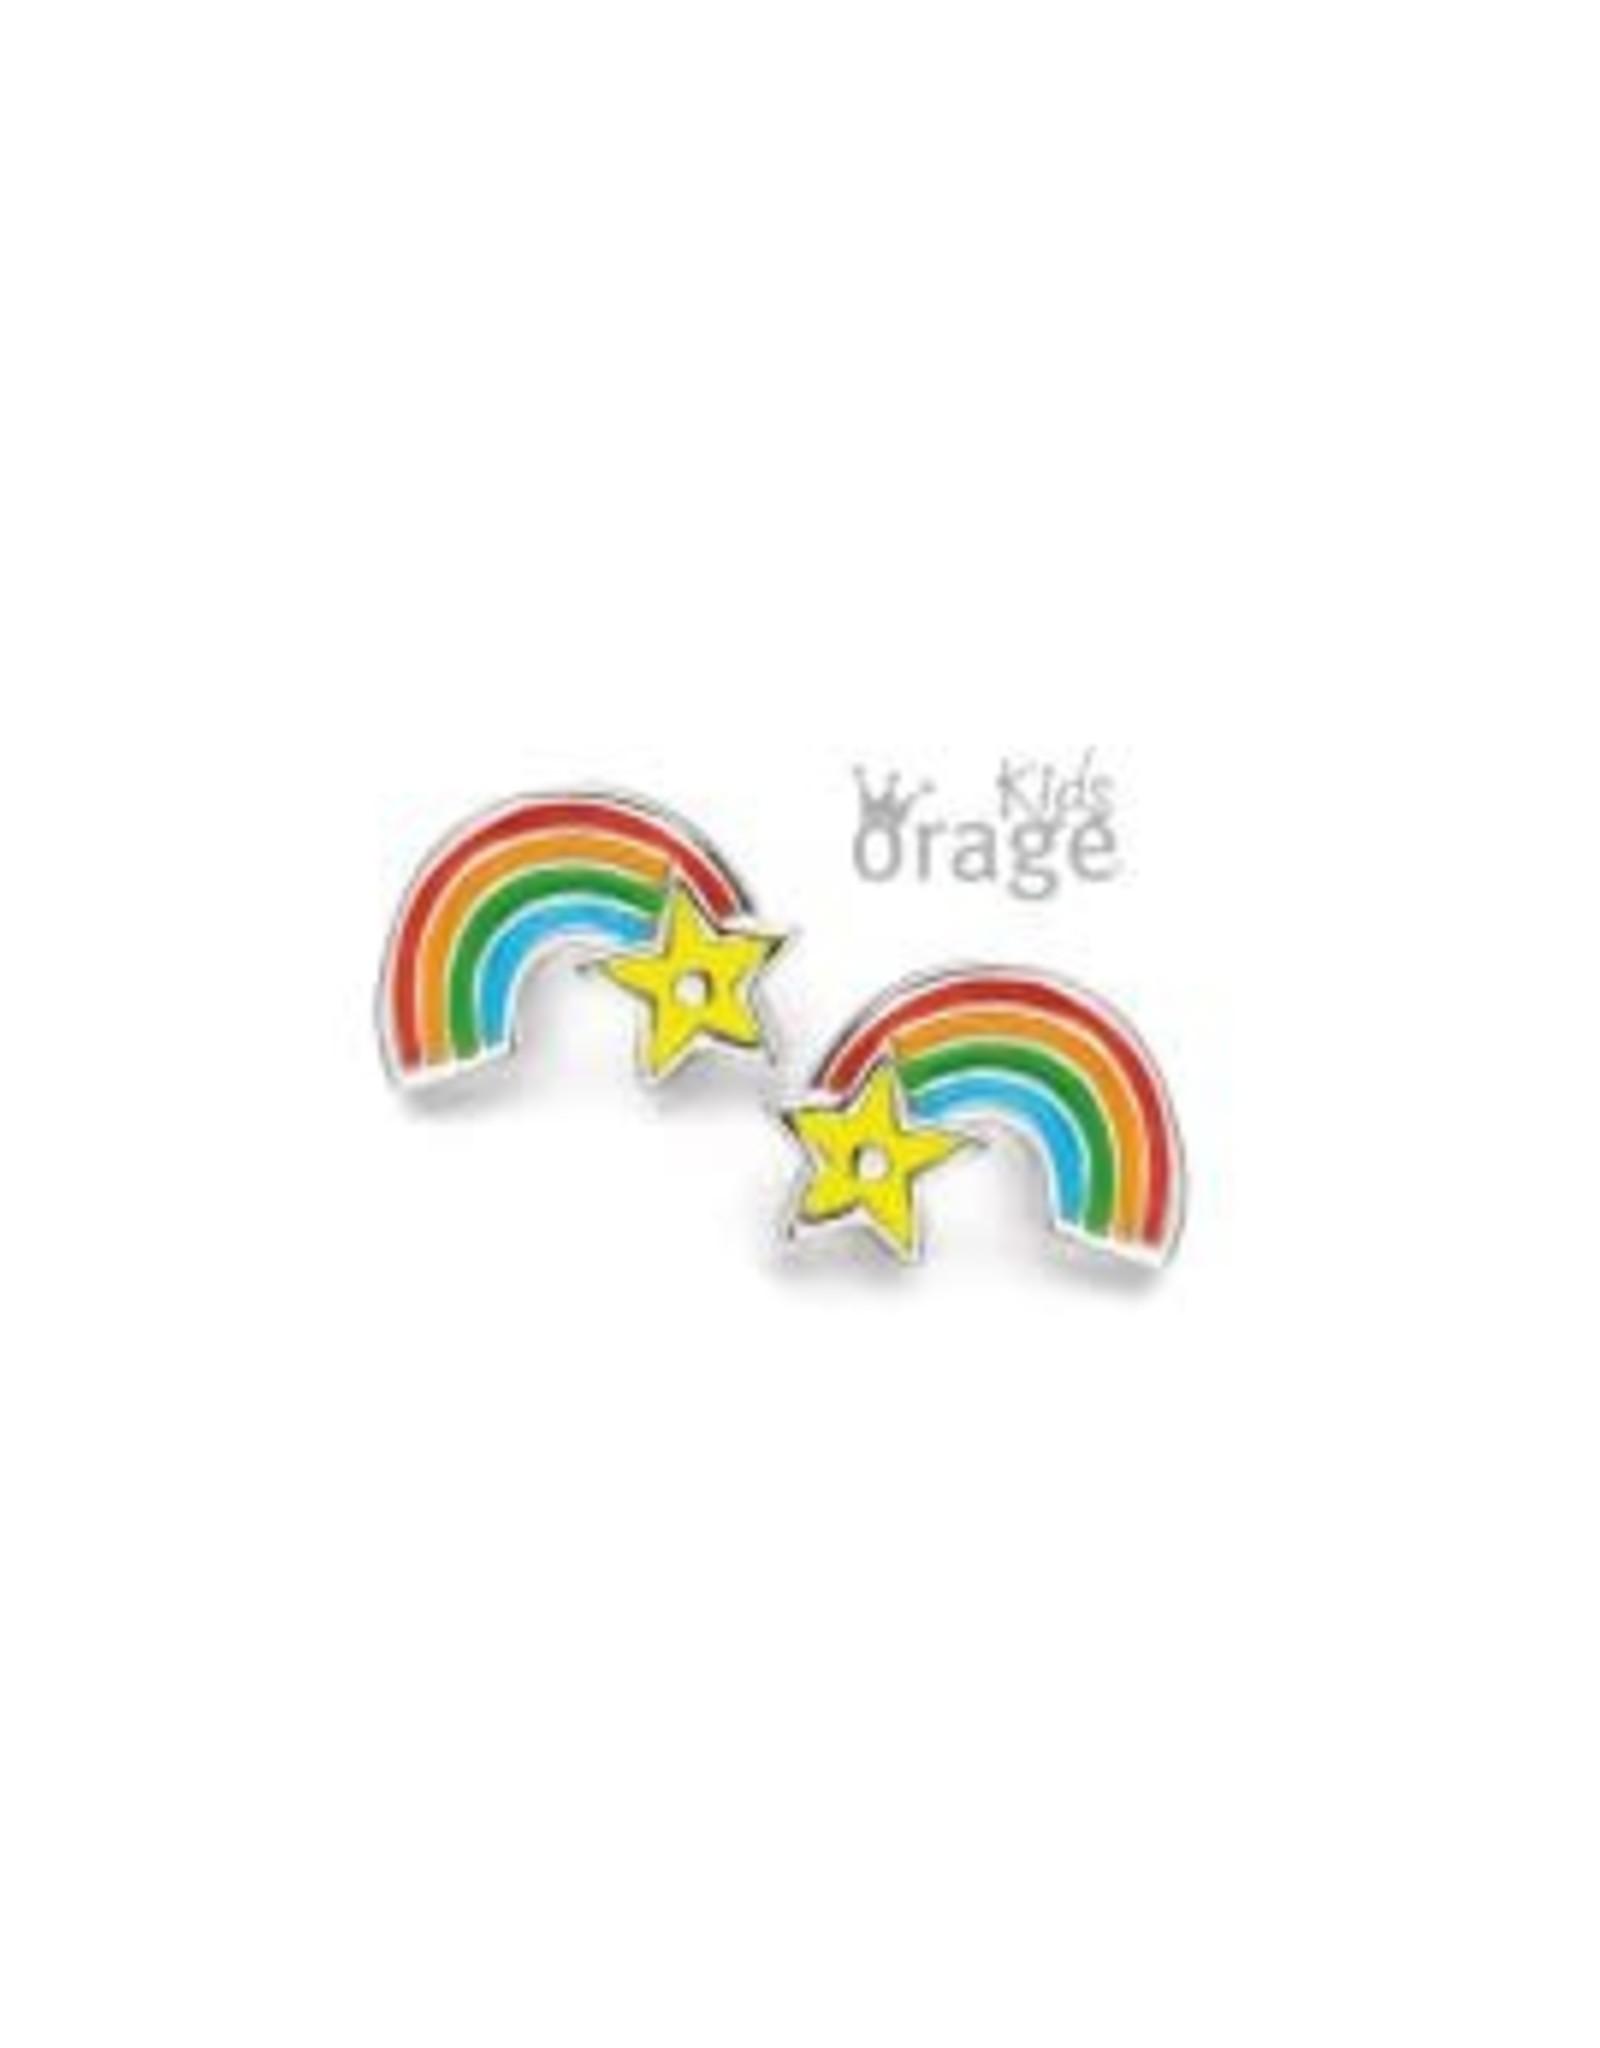 Orage Kids Oorbellen Orage Kids K2125-K1897 Regenboog Zilver